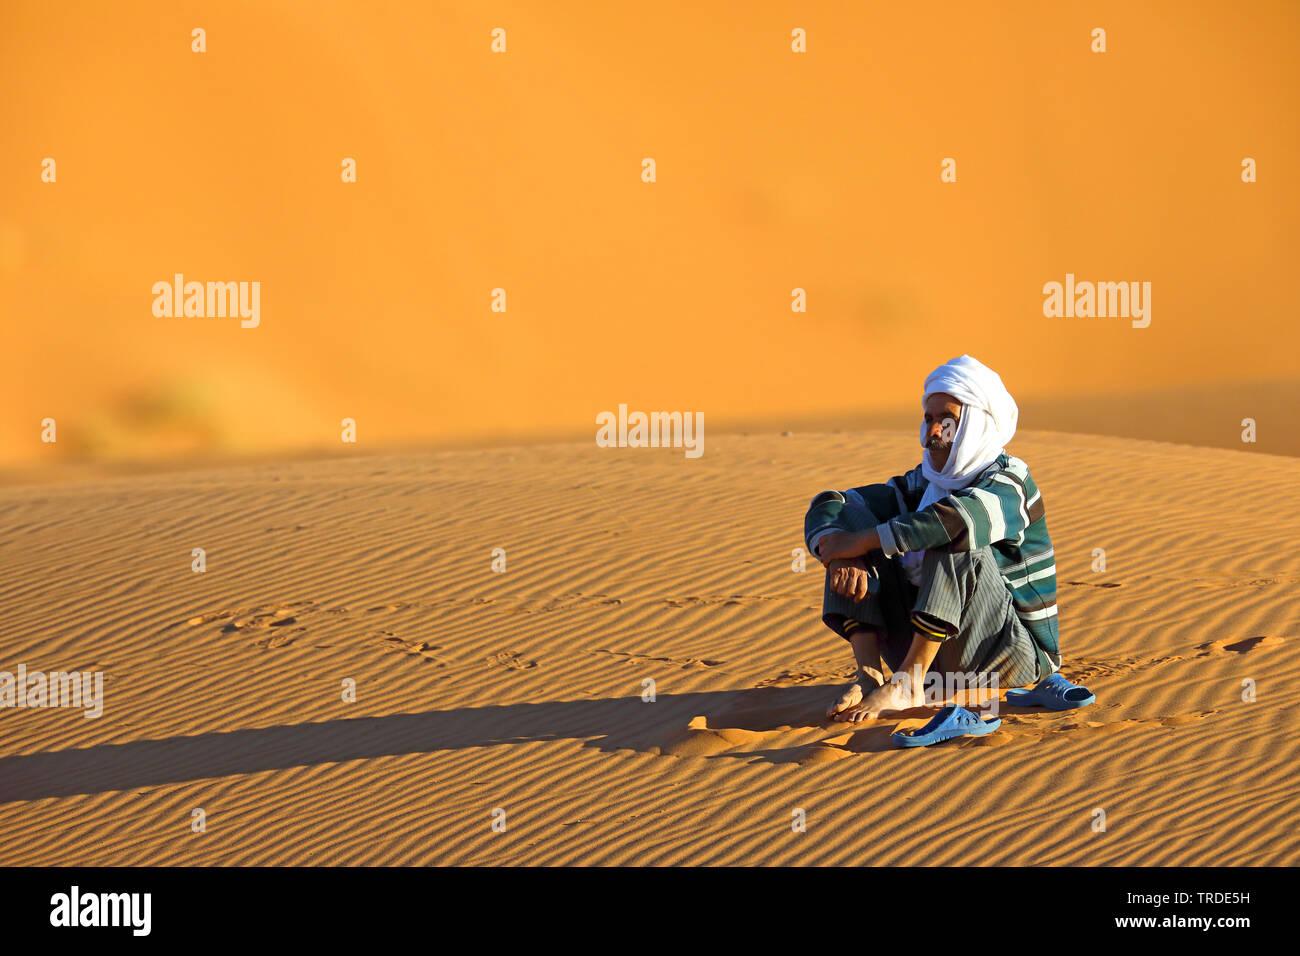 Berber sitzt im Wuestensand, Marokko, Merzouga, Erg Chebbi | Berber sitting in desert sand, Morocco, Merzouga, Erg Chebbi | BLWS501582.jpg [ (c) blick - Stock Image